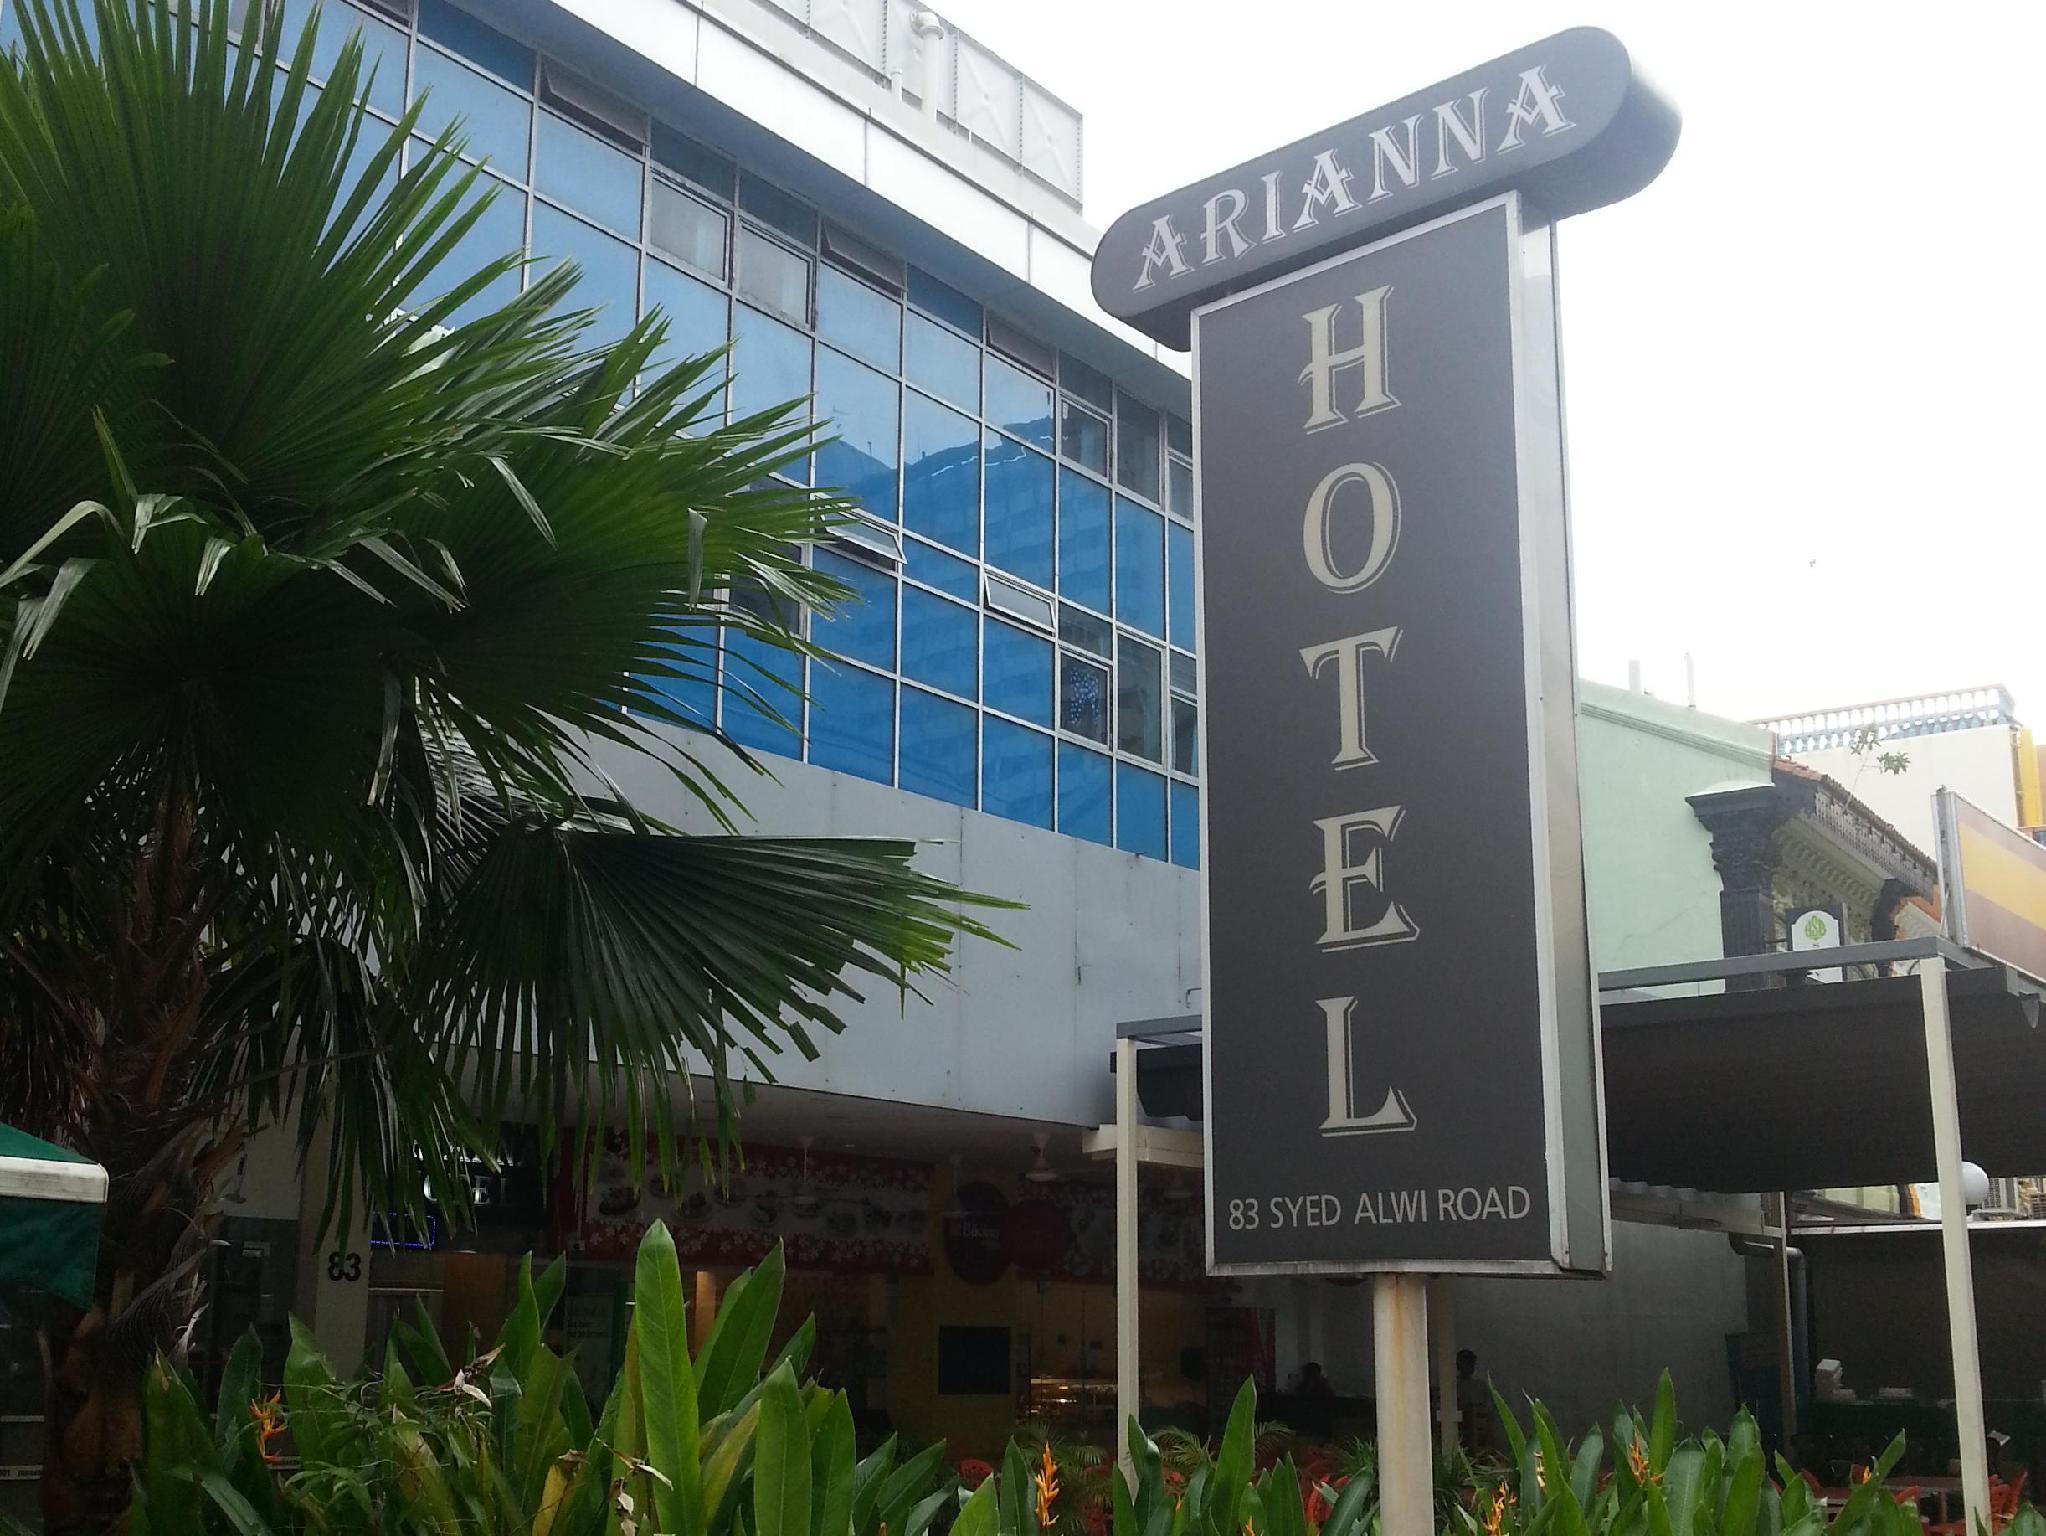 Singapore Hotel Average Room Rate